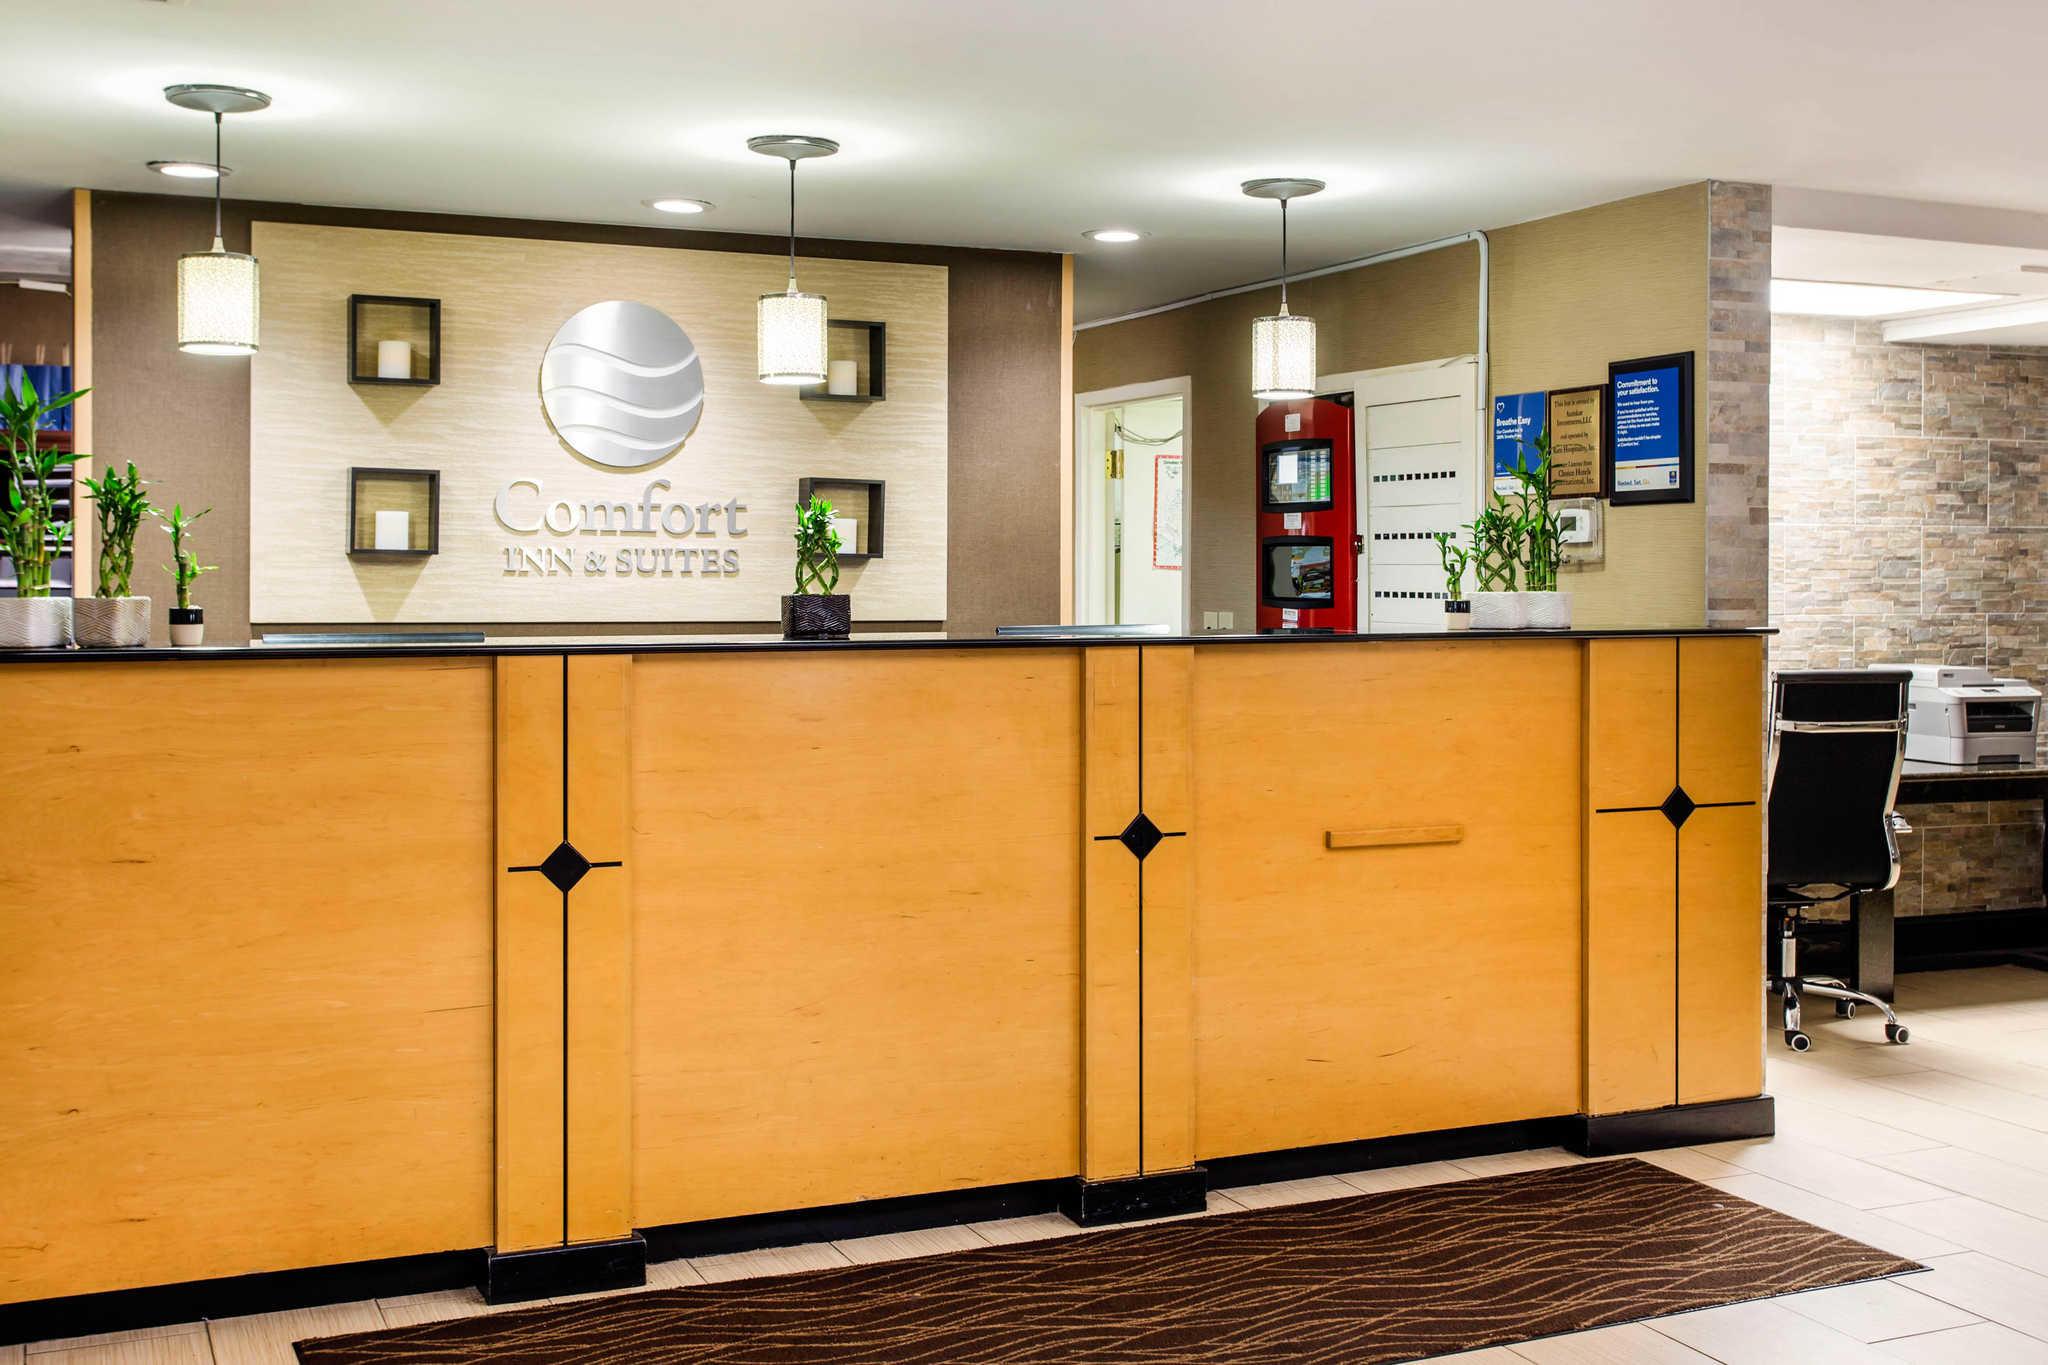 Comfort Inn & Suites Crabtree Valley image 3